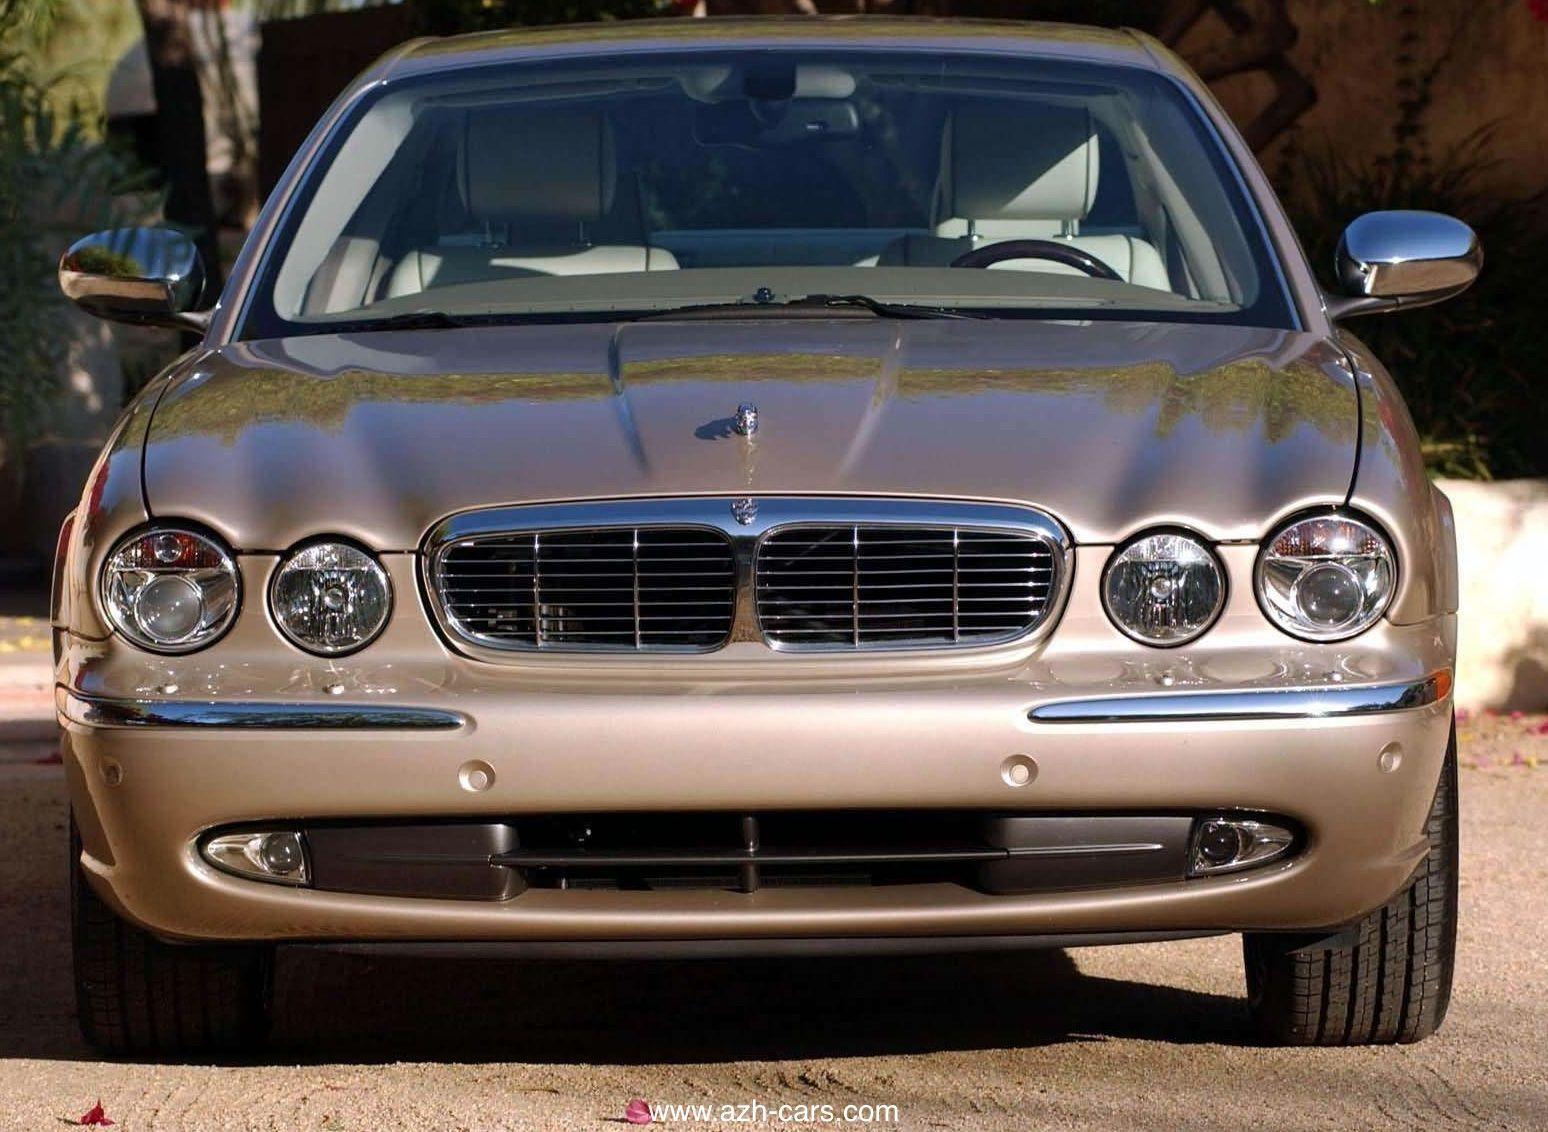 Jaguar Xj8 Vanden Plas 2004 Jaguar Bmw Bmw Car